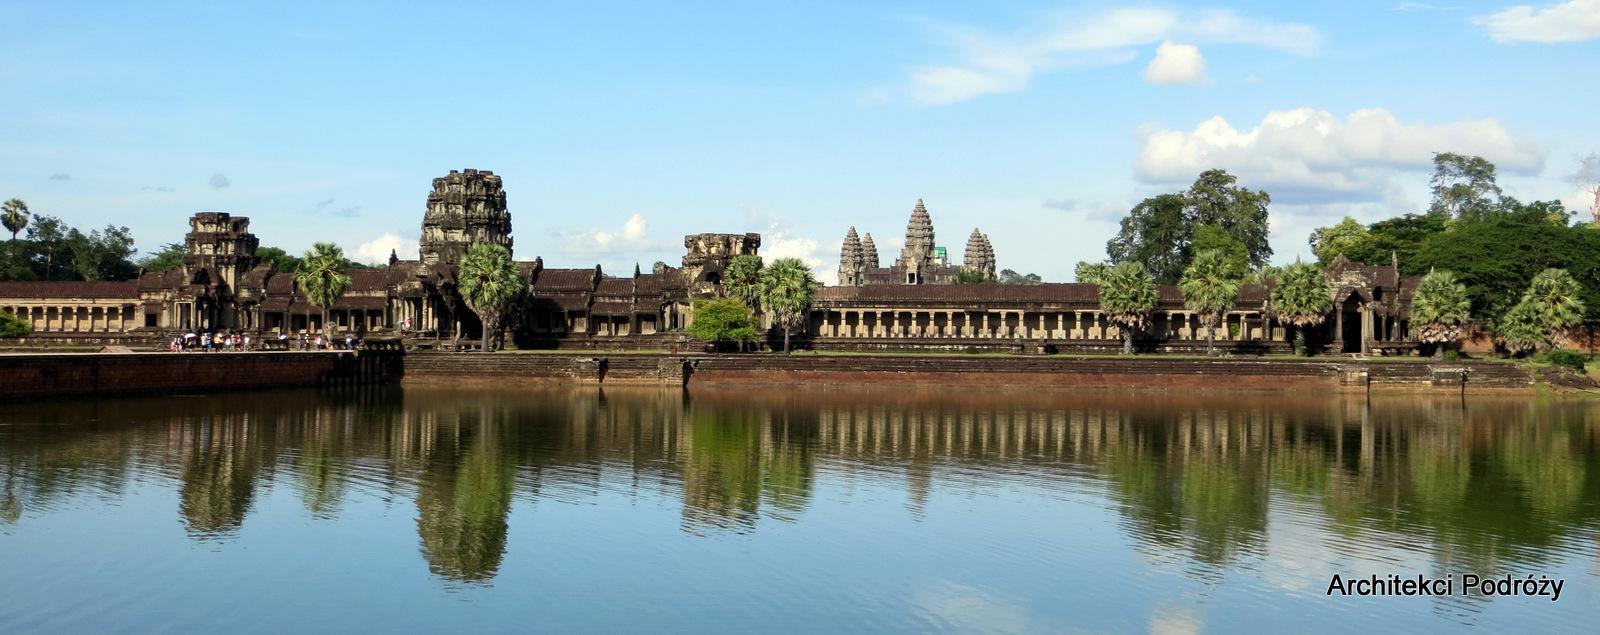 Kambodża - Angkor Wat